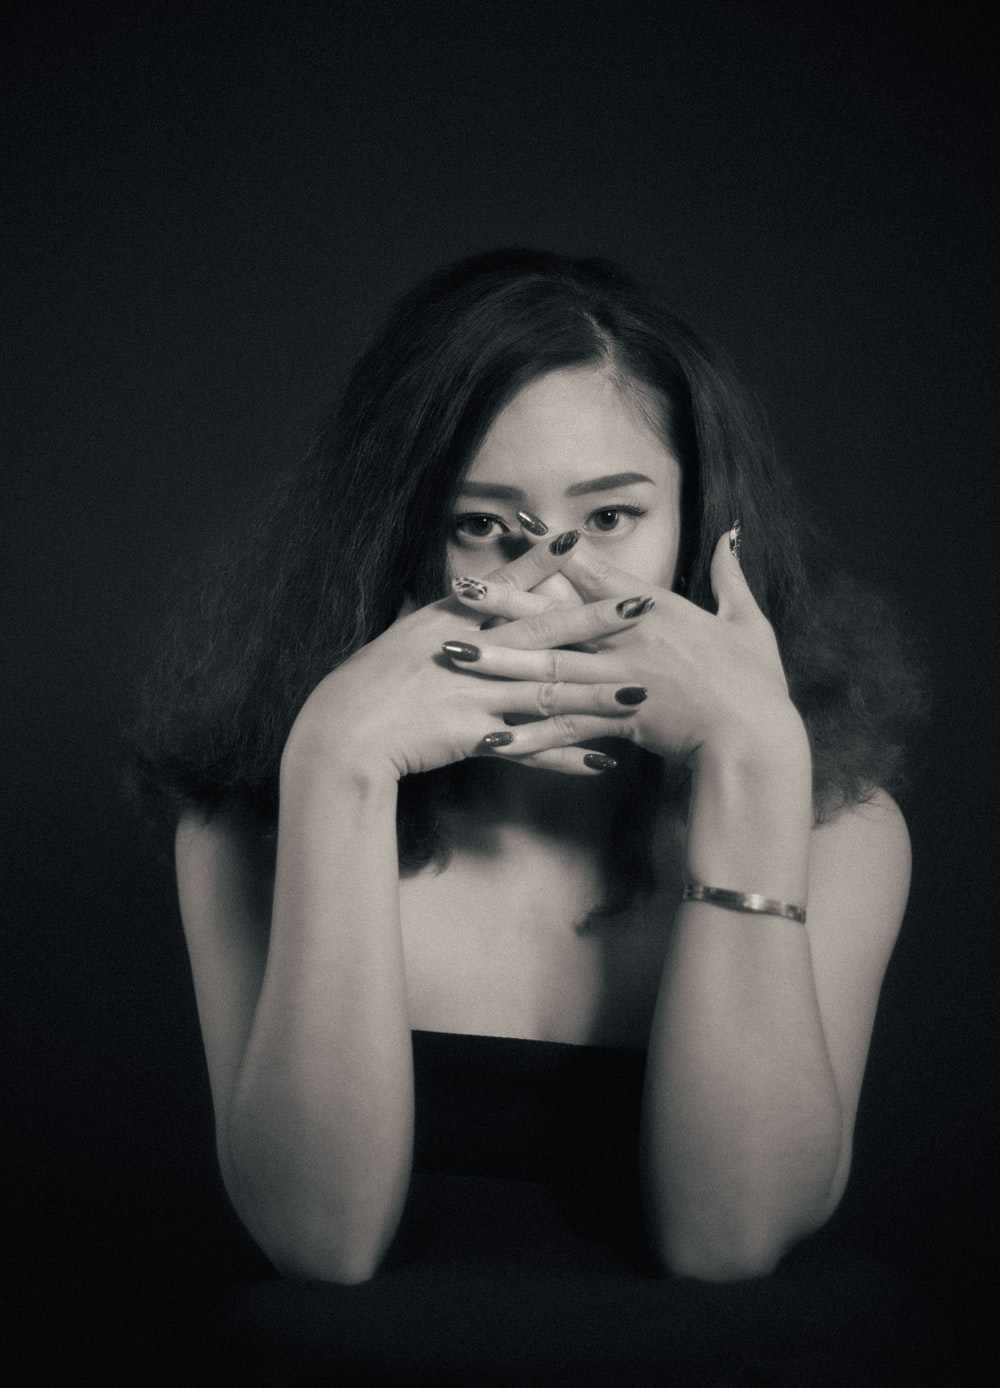 woman in black tube top